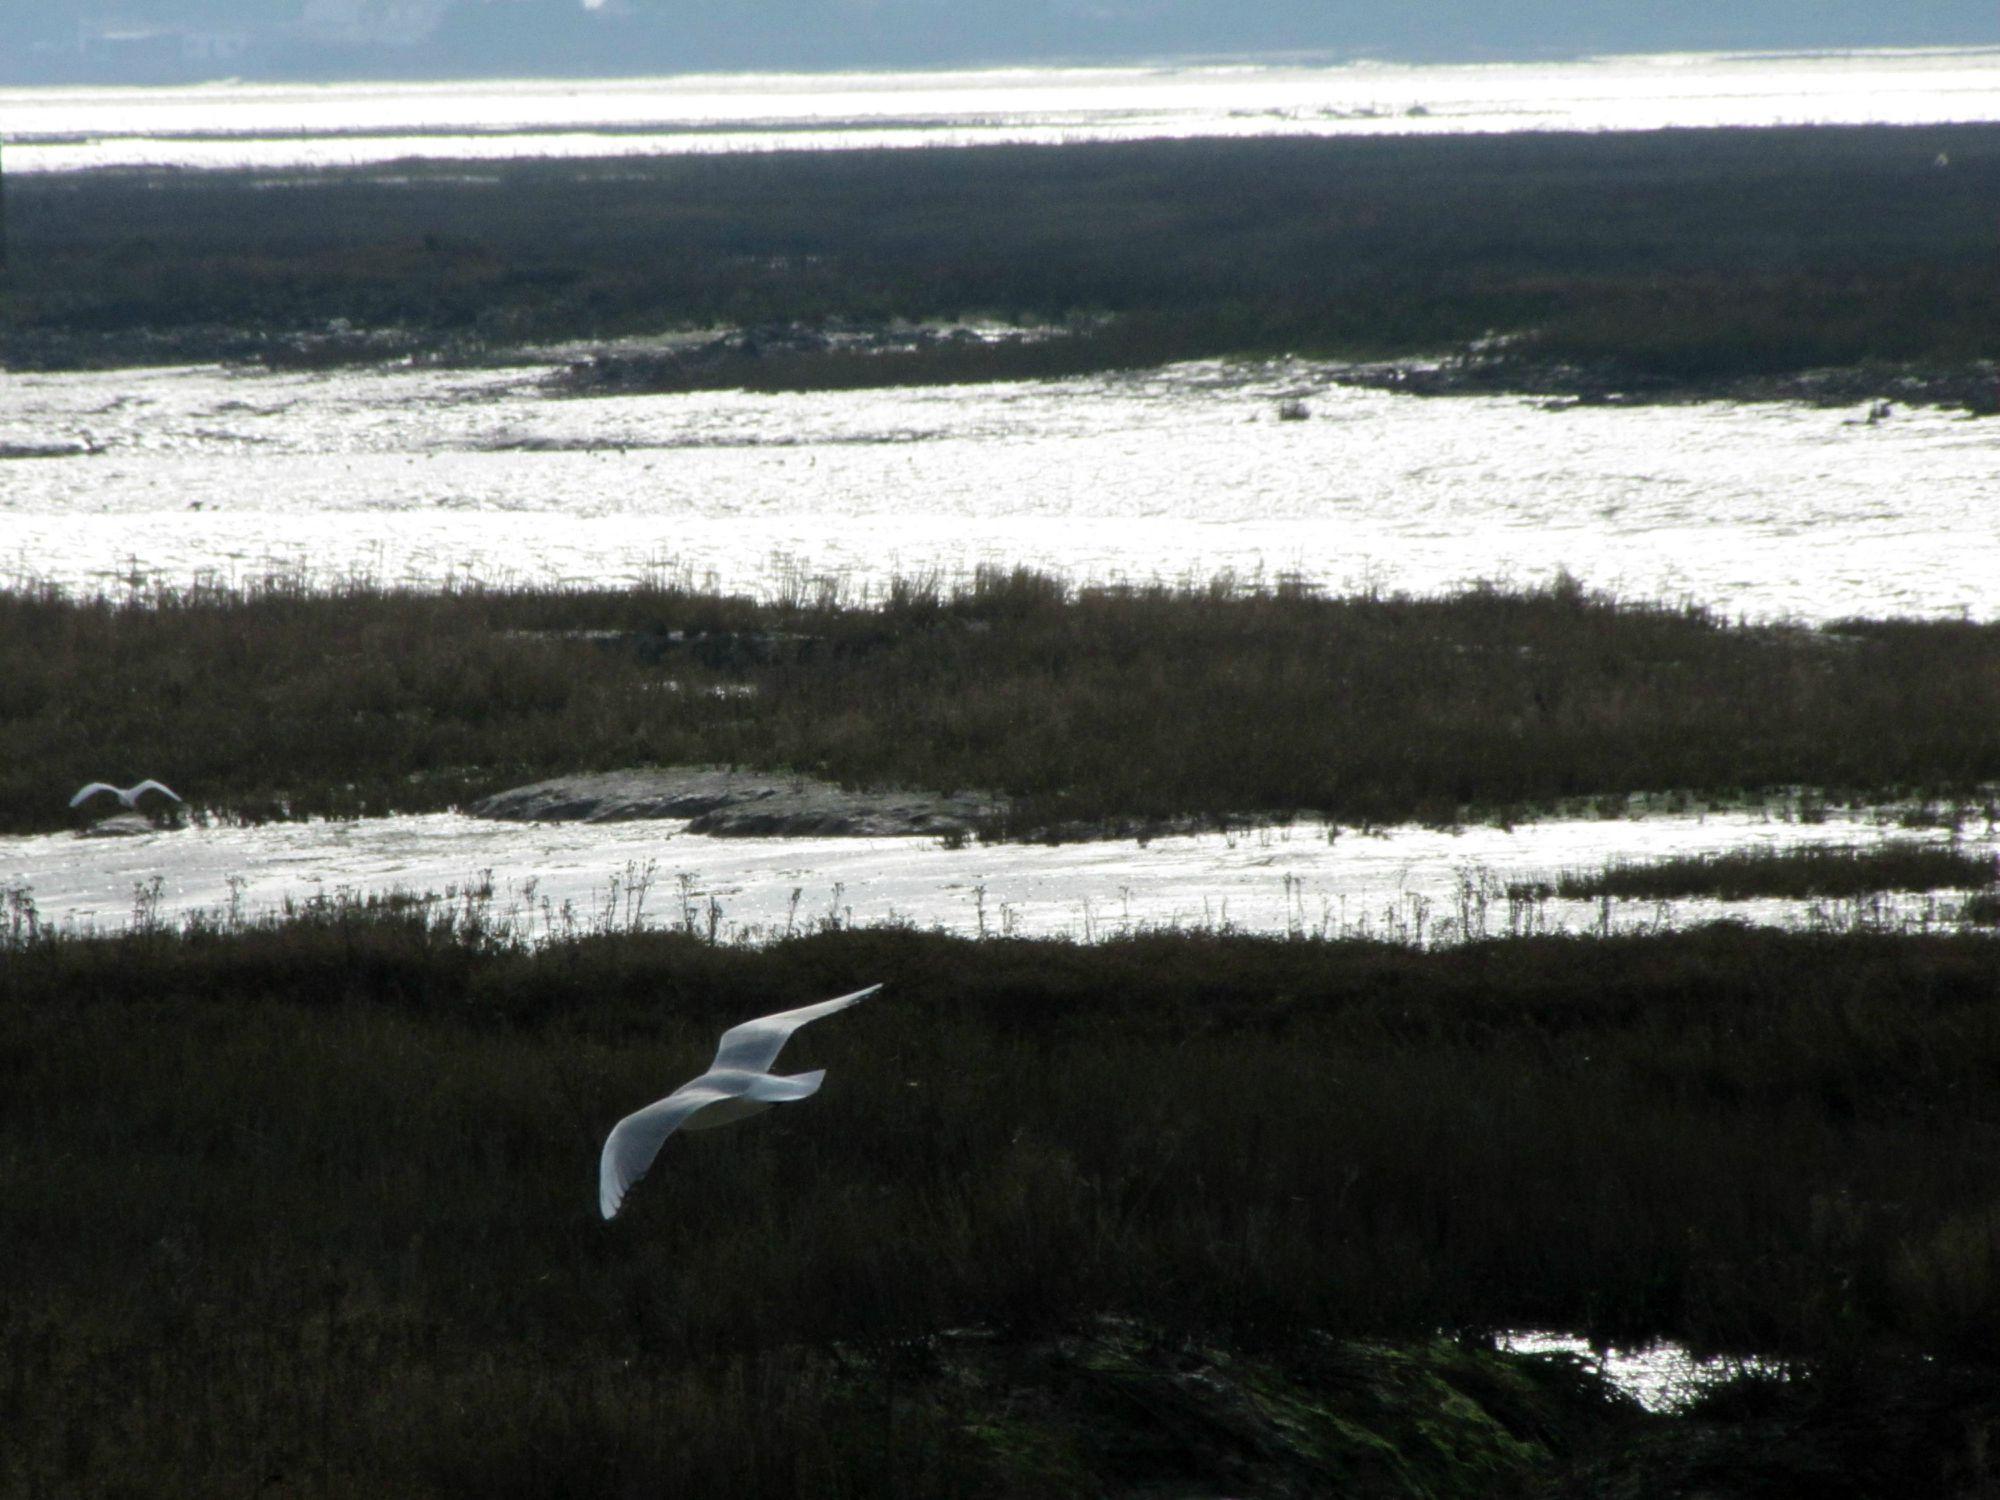 Oiseaux ile de re mouette spectrale foto Mo2 (14)-h1500